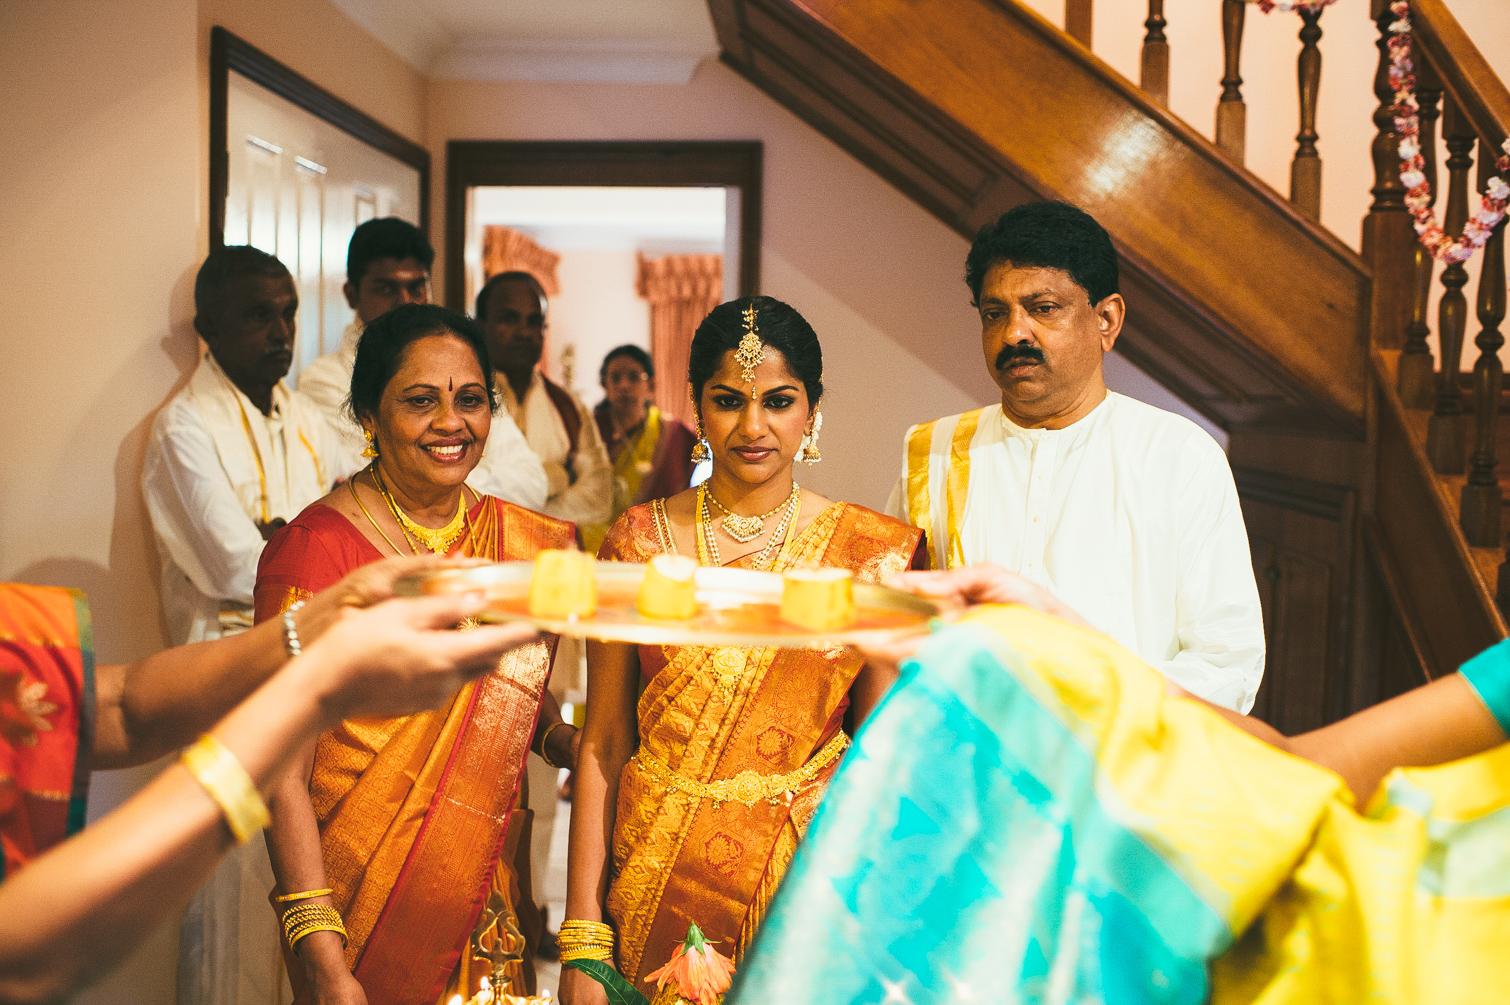 sri venkateswara temple wedding photography 10.jpg